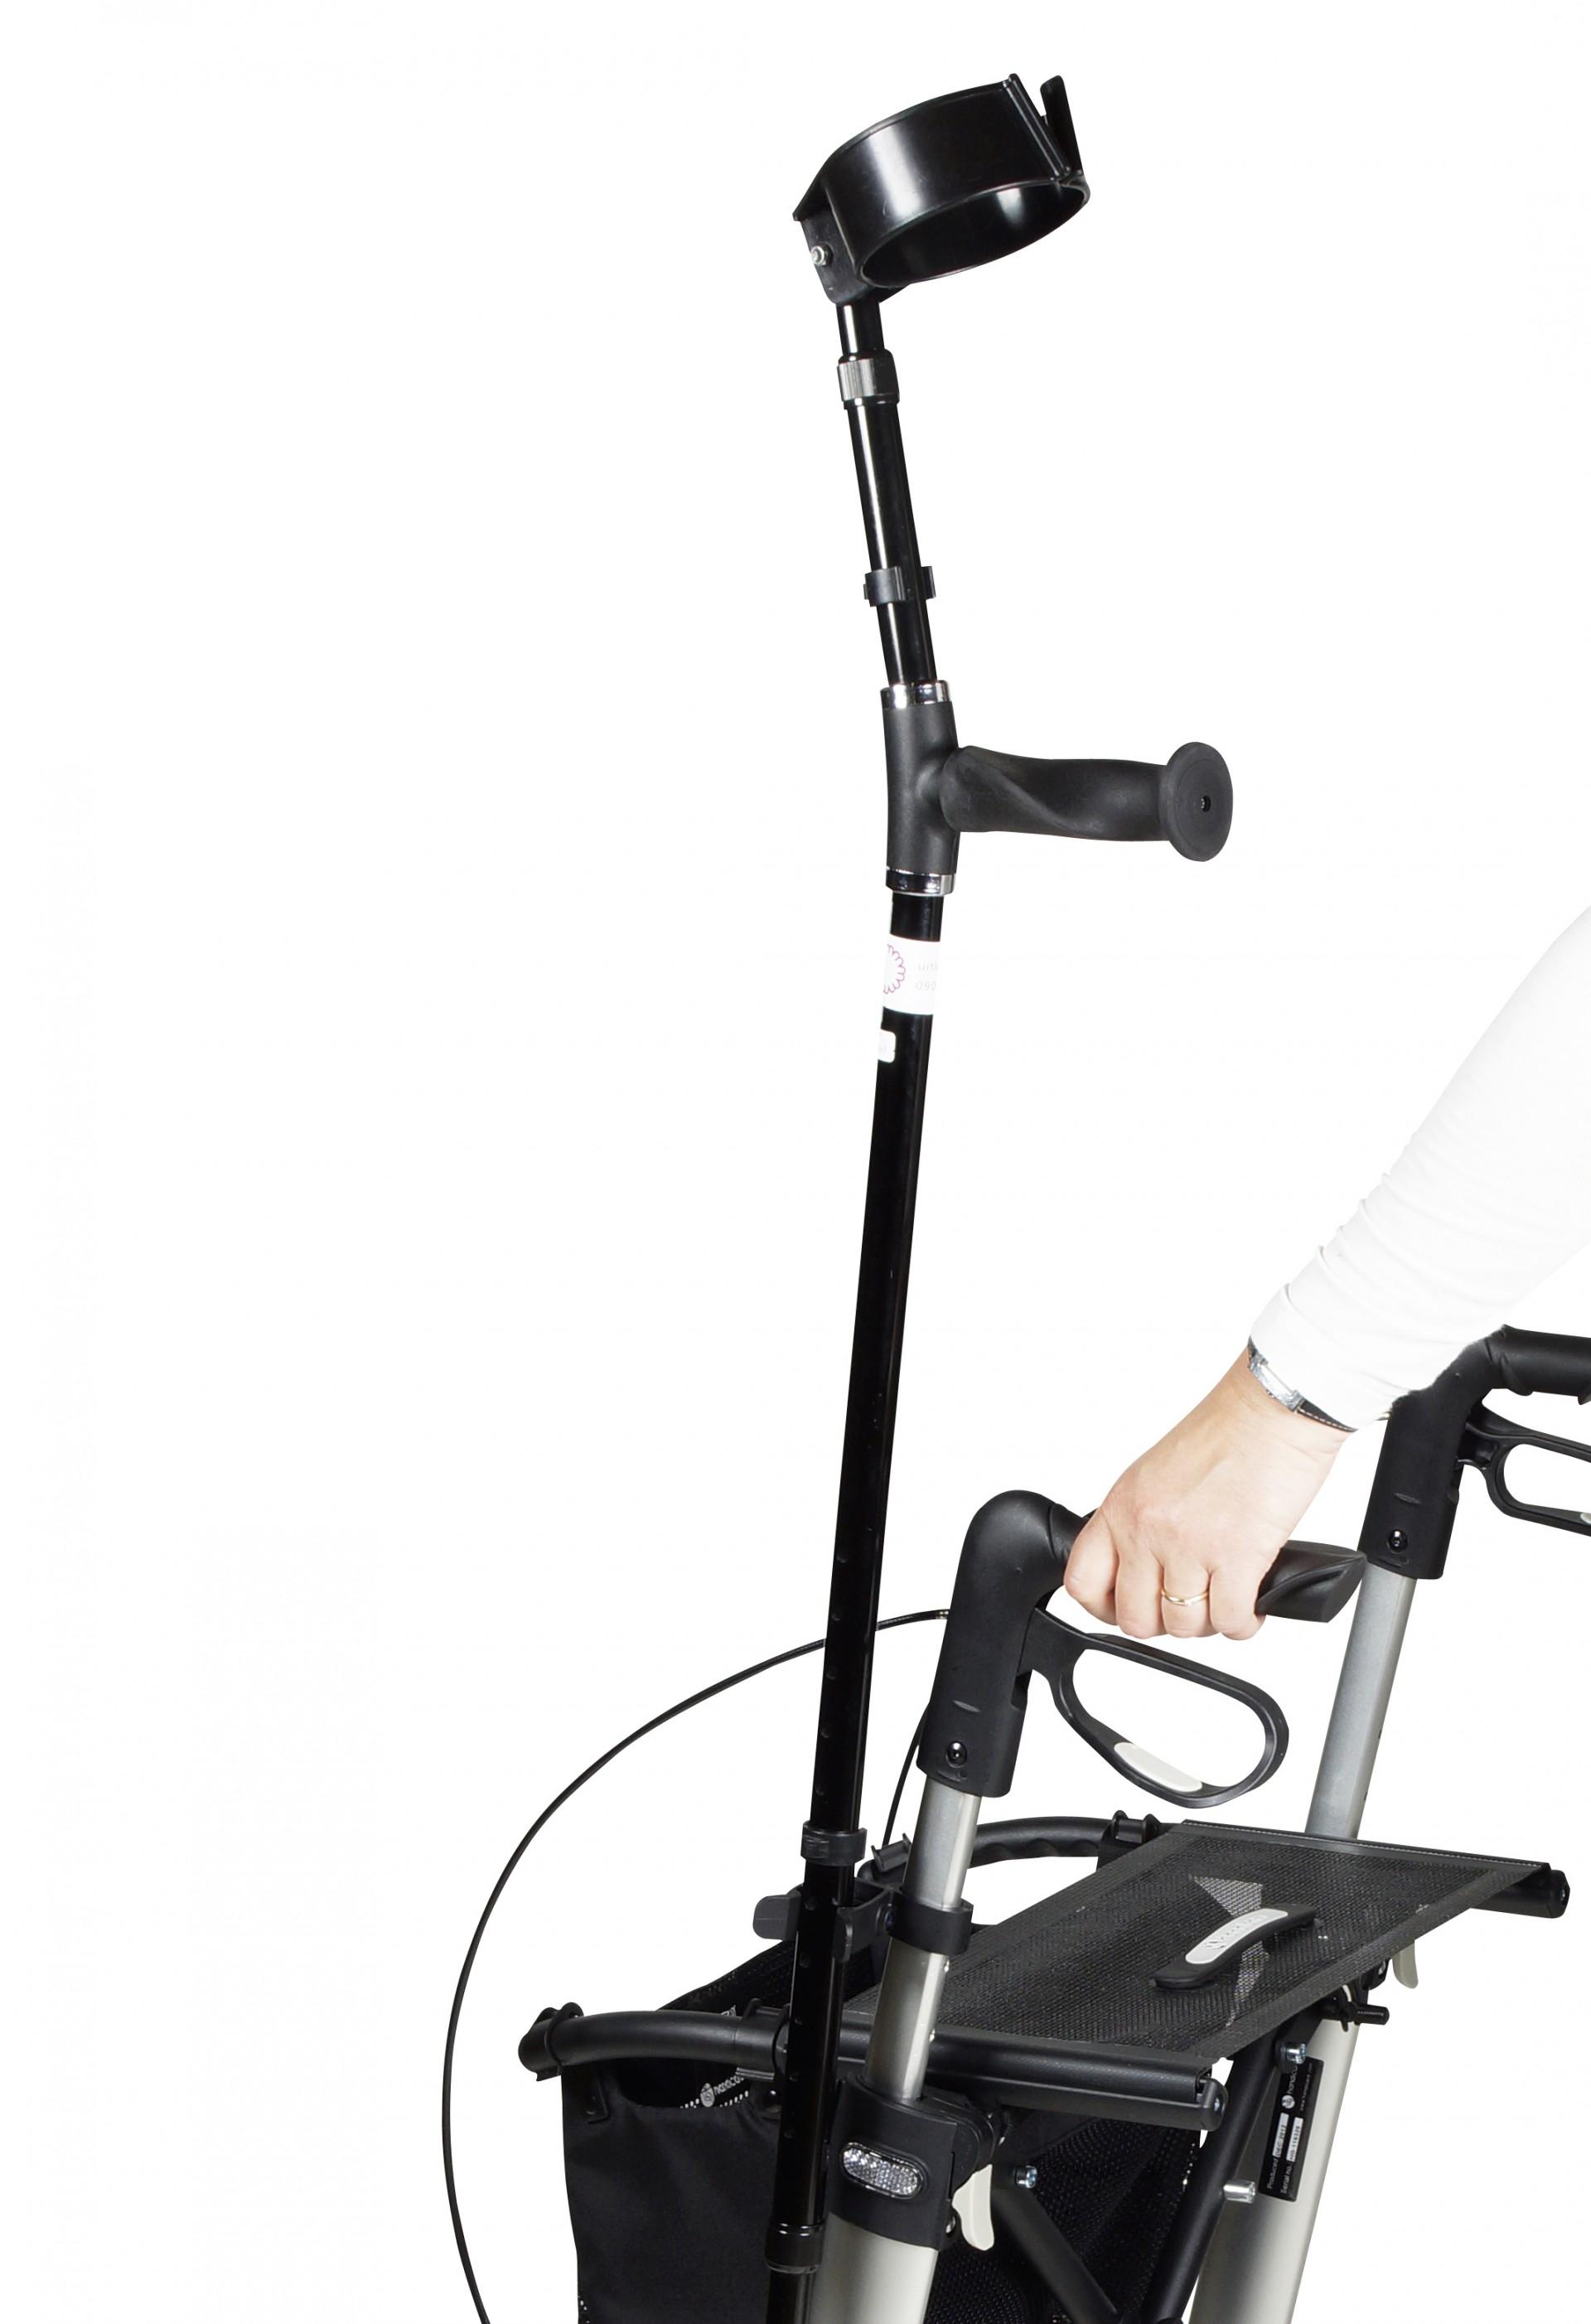 Stokhouder voor Gemino rollator van Sunrise Medical